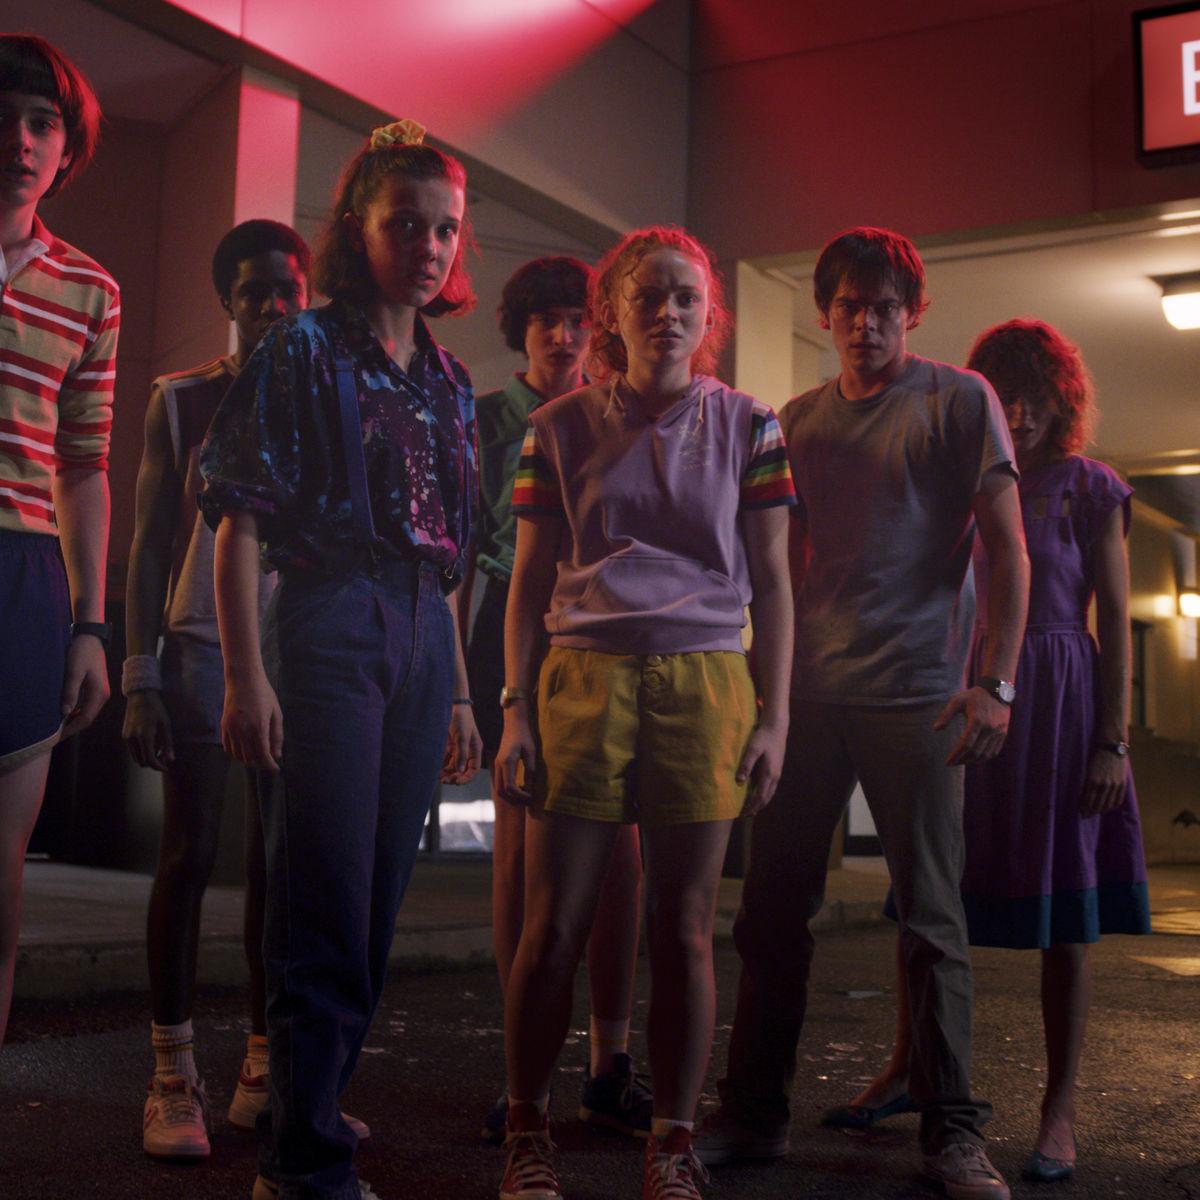 Stranger Things 3 group shot